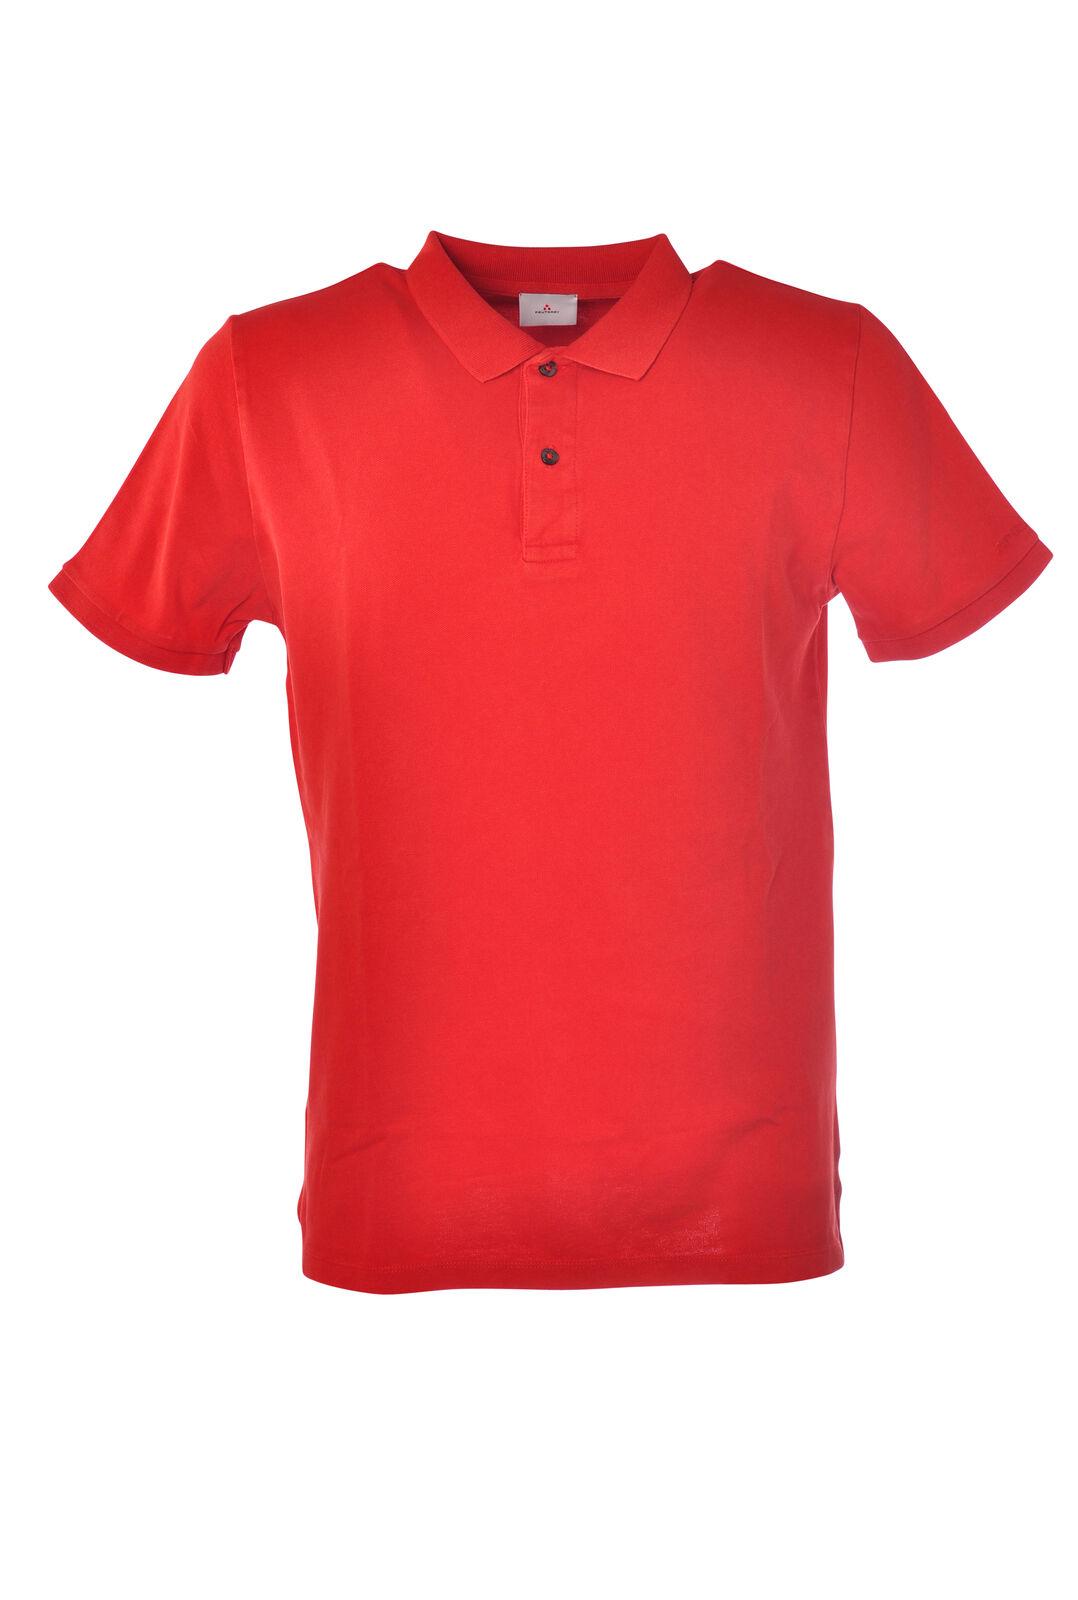 Peuterey - Topwear-Polo - Man - ROT - 5322308F185155